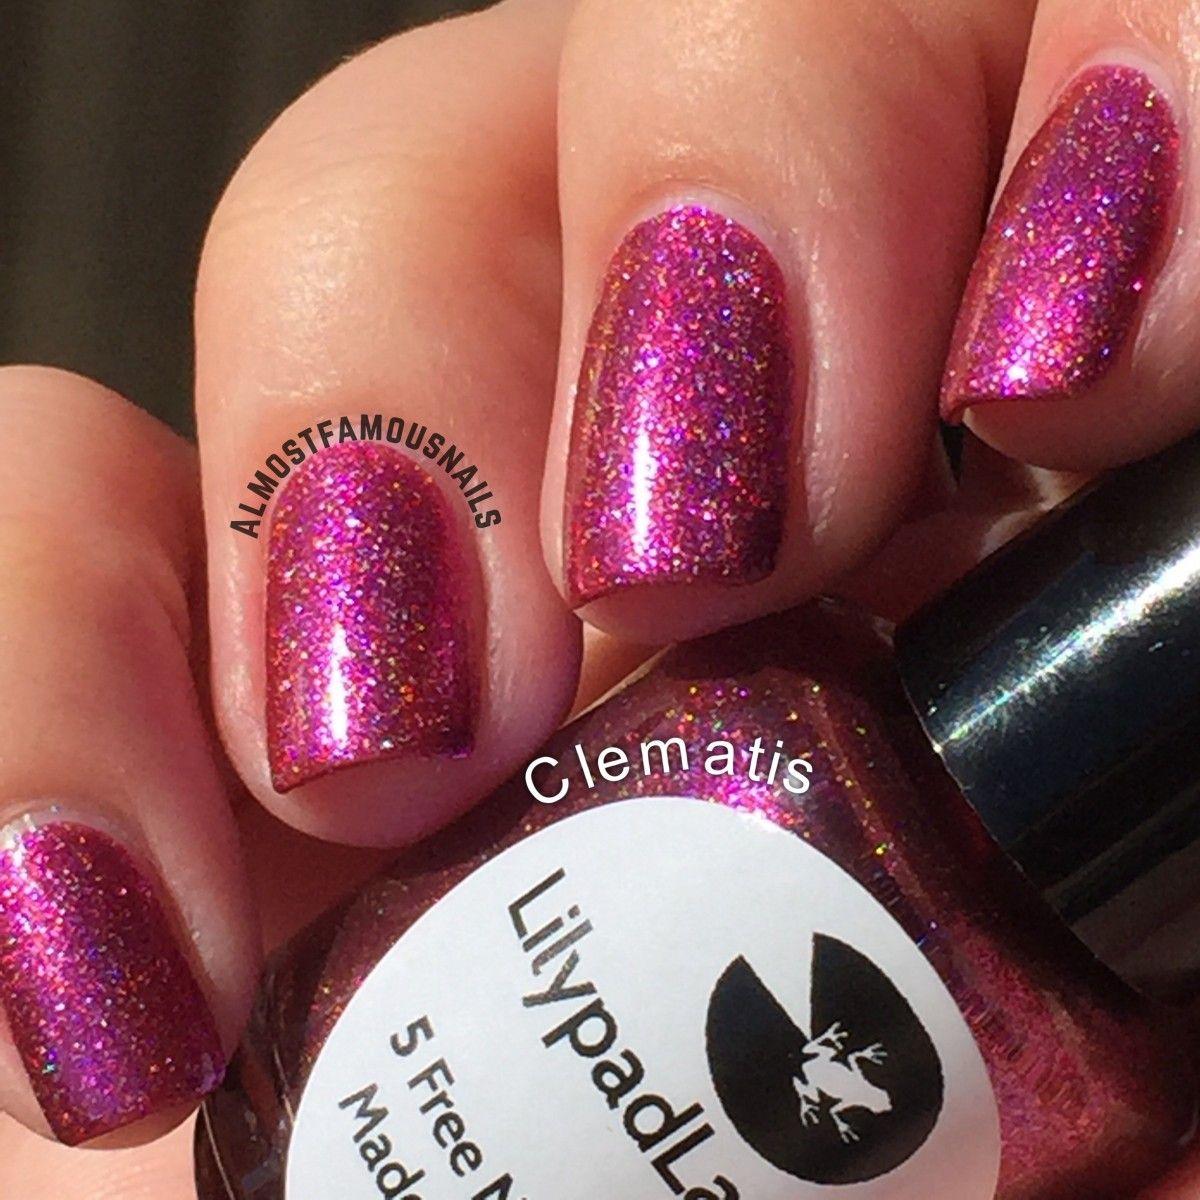 Lilypad Lacquer - Clematis LE | Lilypad Stash | Pinterest